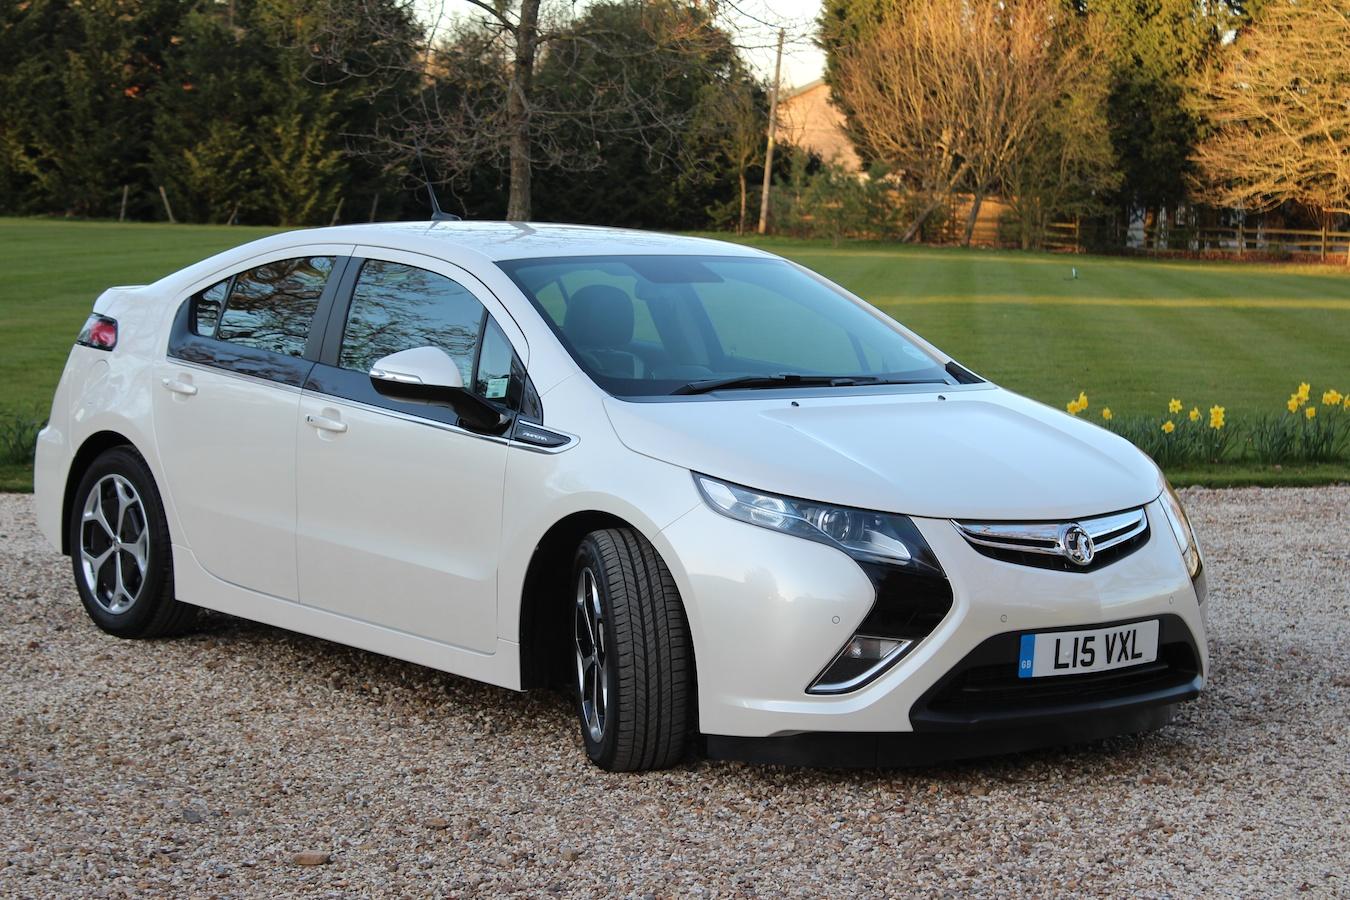 uk teen takes driving testand passesin electric car